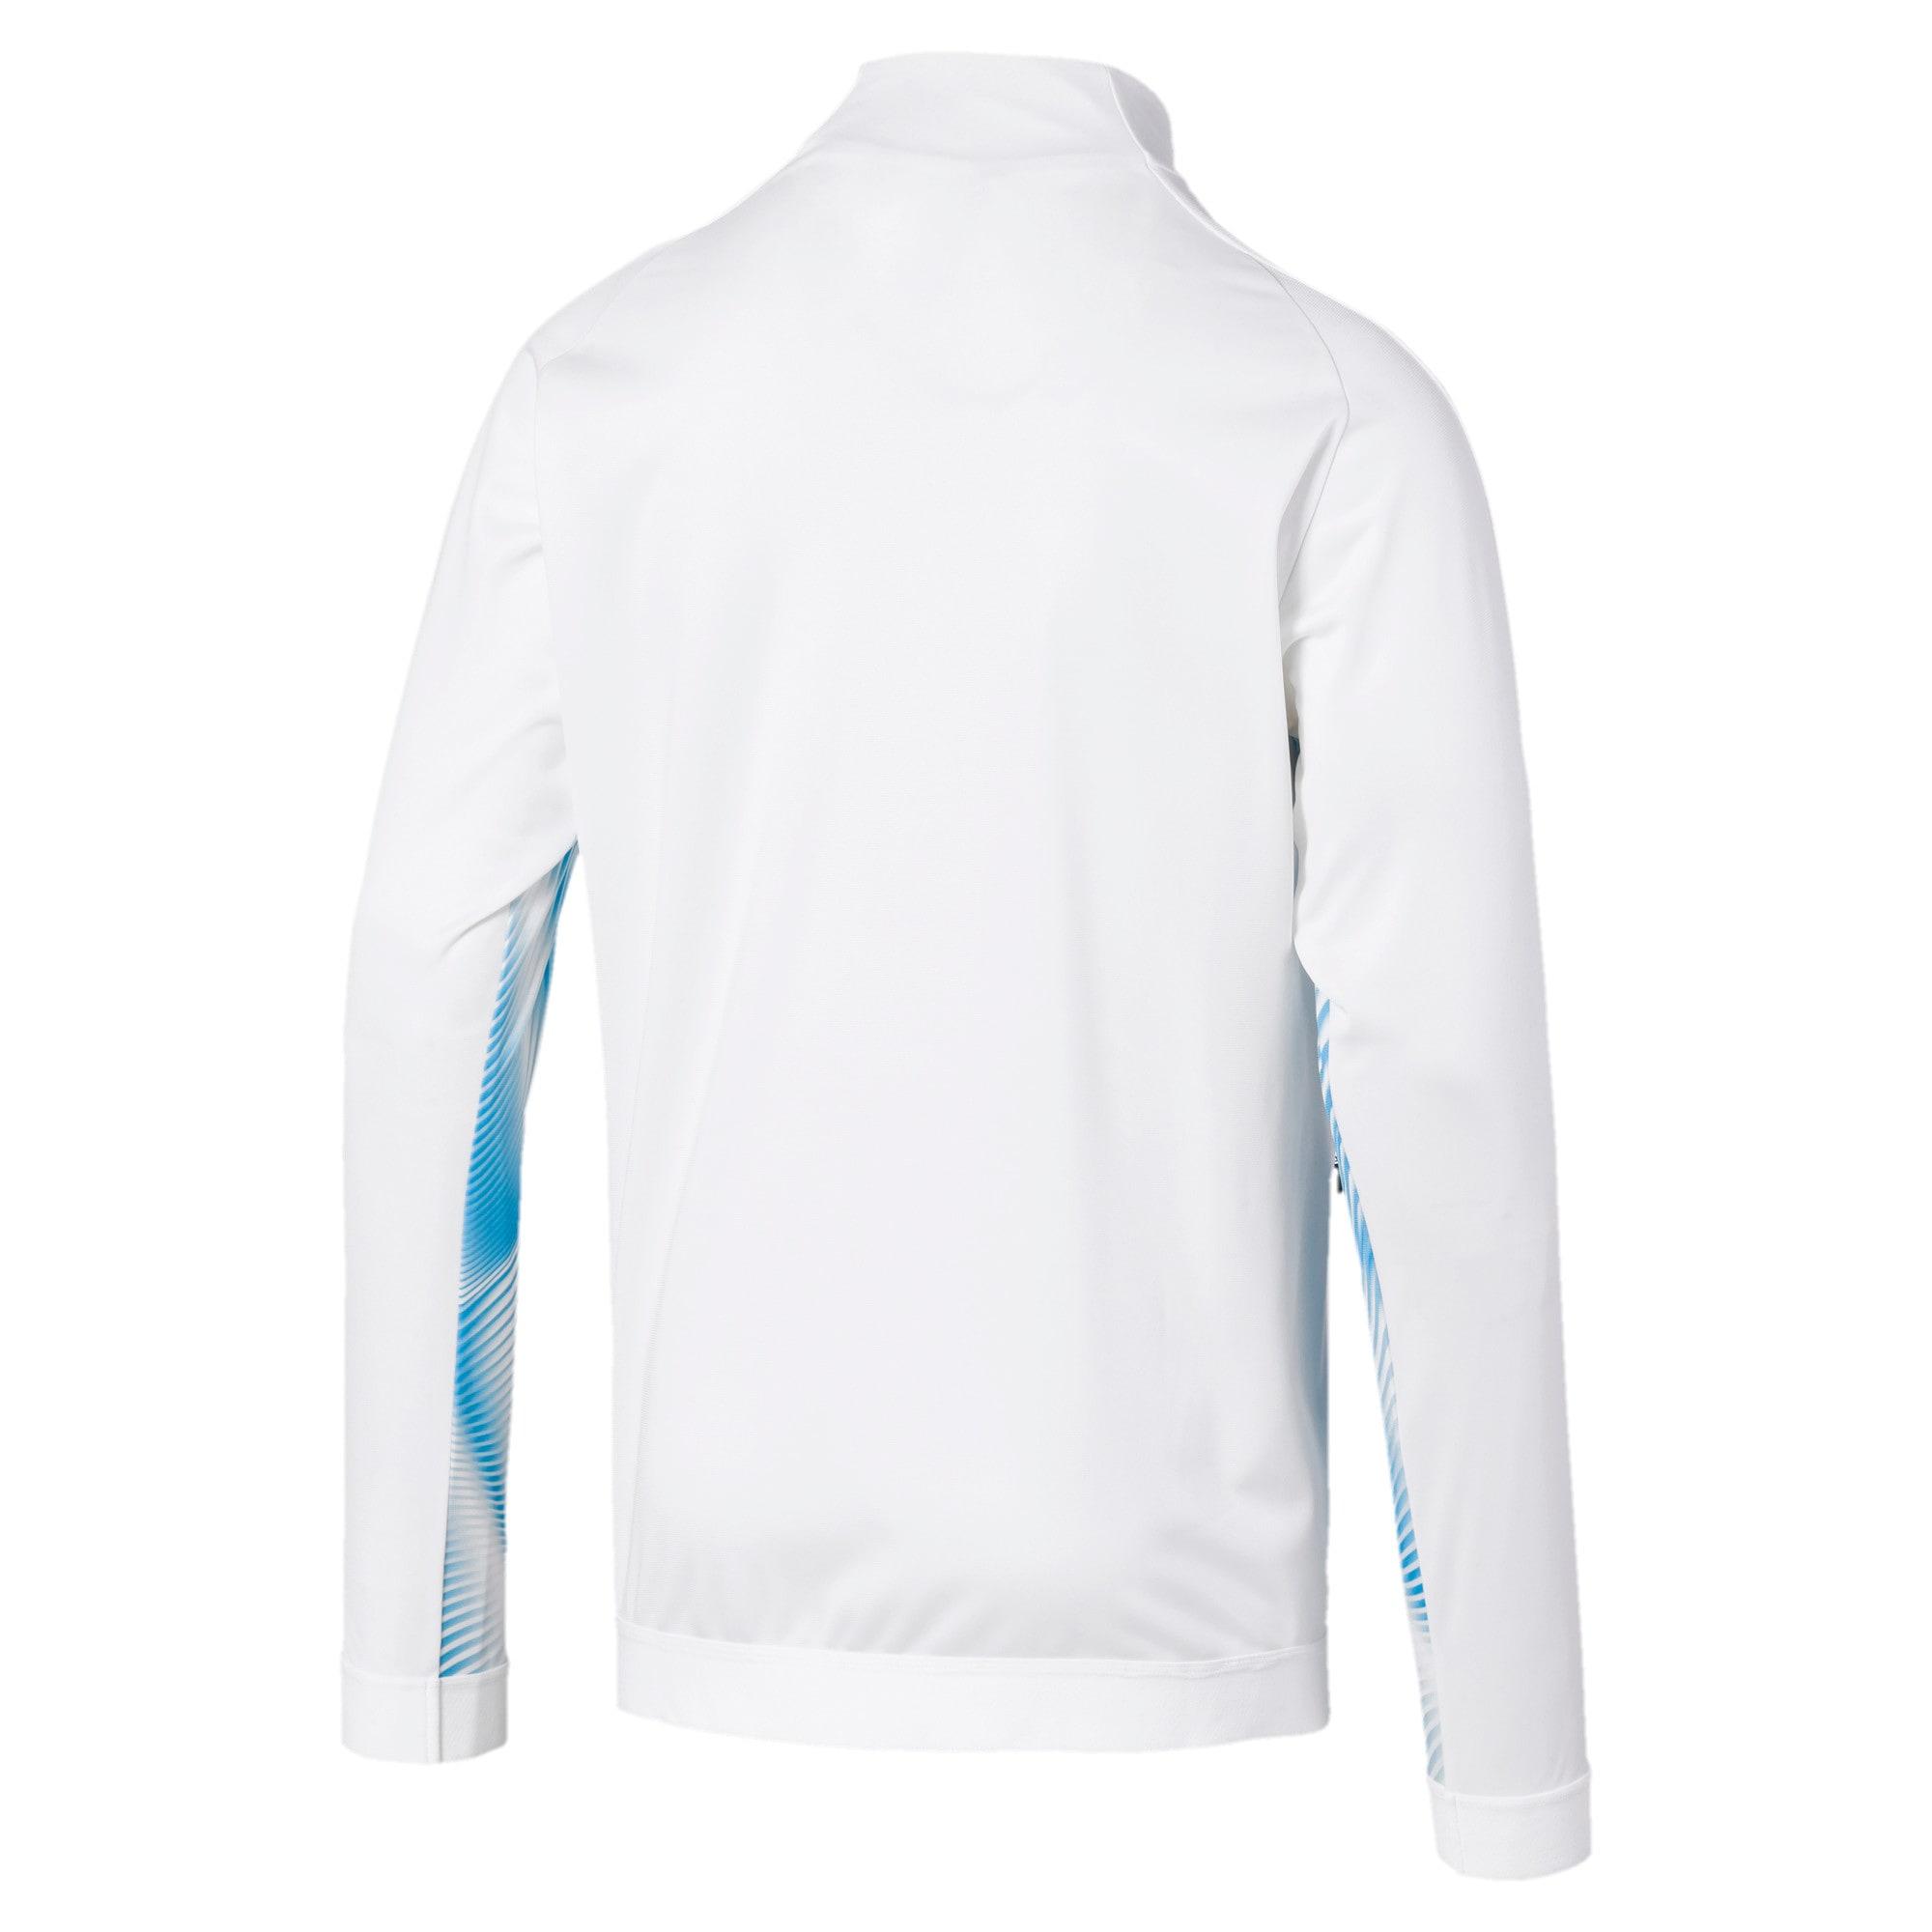 Thumbnail 2 of Olympique de Marseille Men's Stadium Jacket, Puma White-Bleu Azur, medium